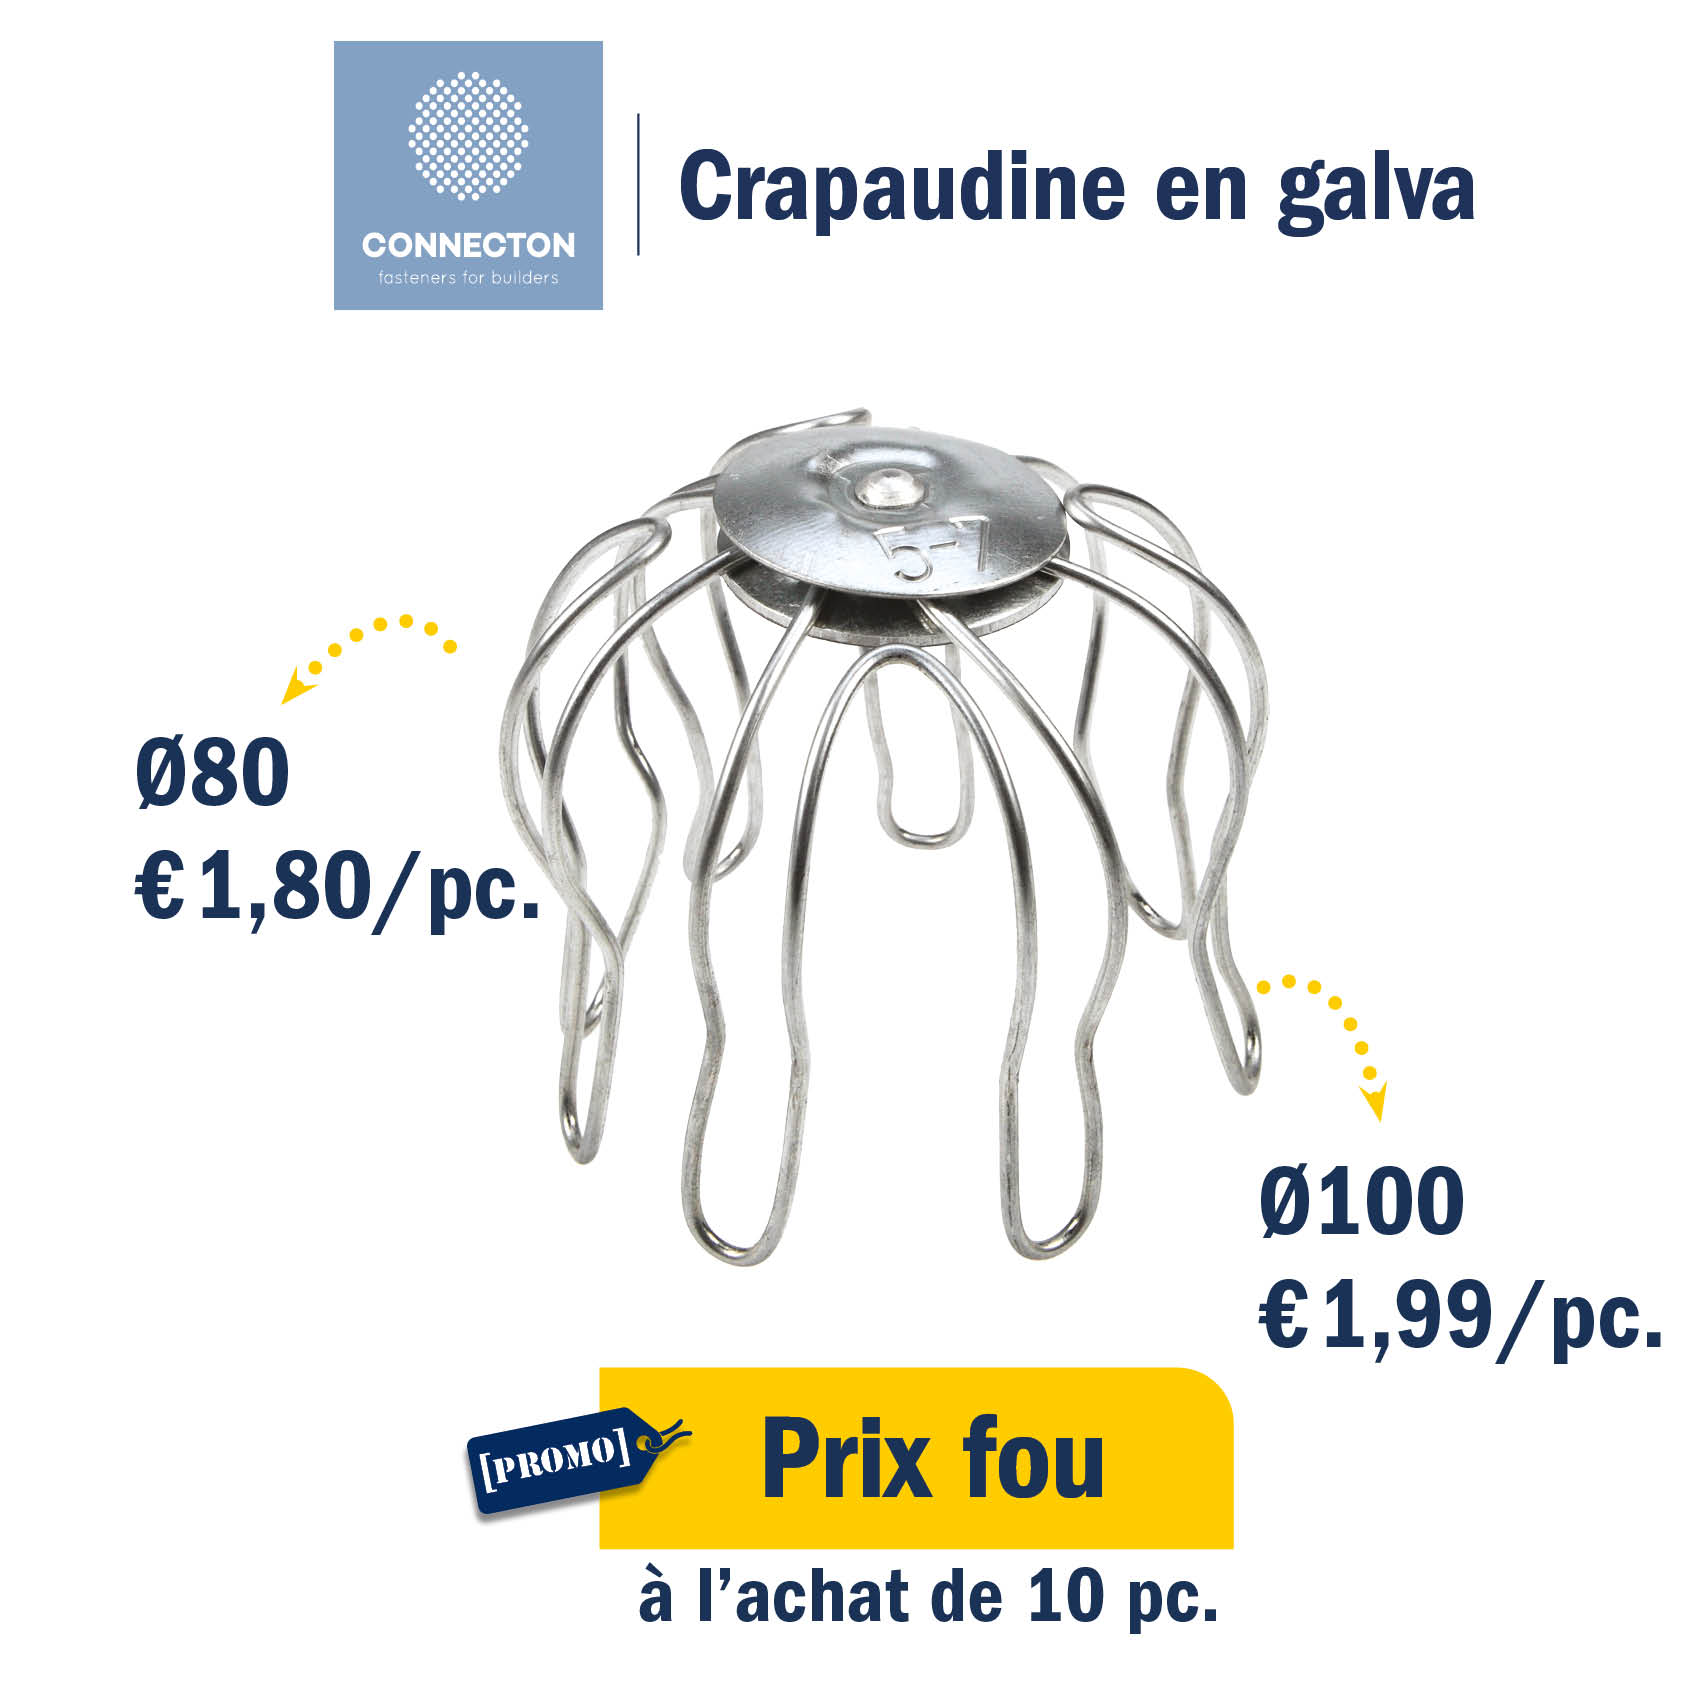 Crapaudine en GALVA : prix promo de €1,8 et €1,99